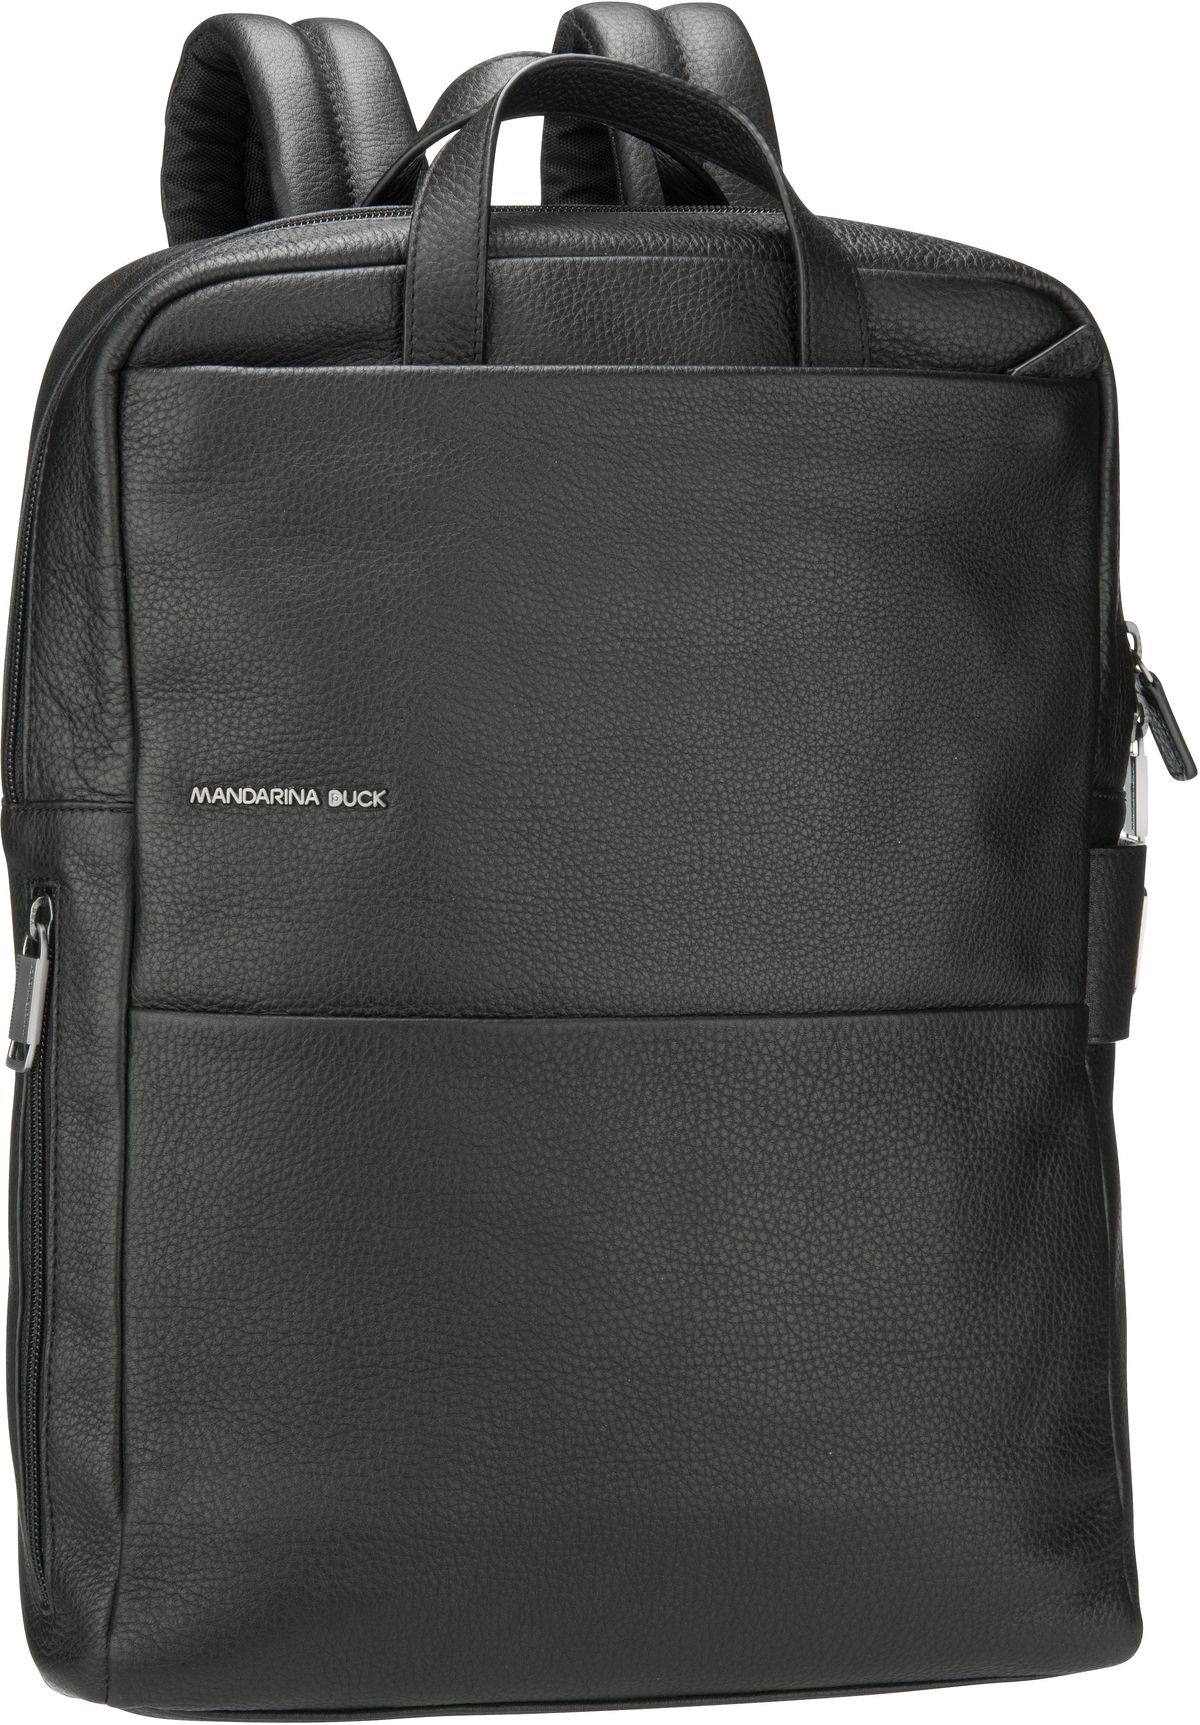 Rucksack / Daypack Detroit Leather Backpack UZT03 Black